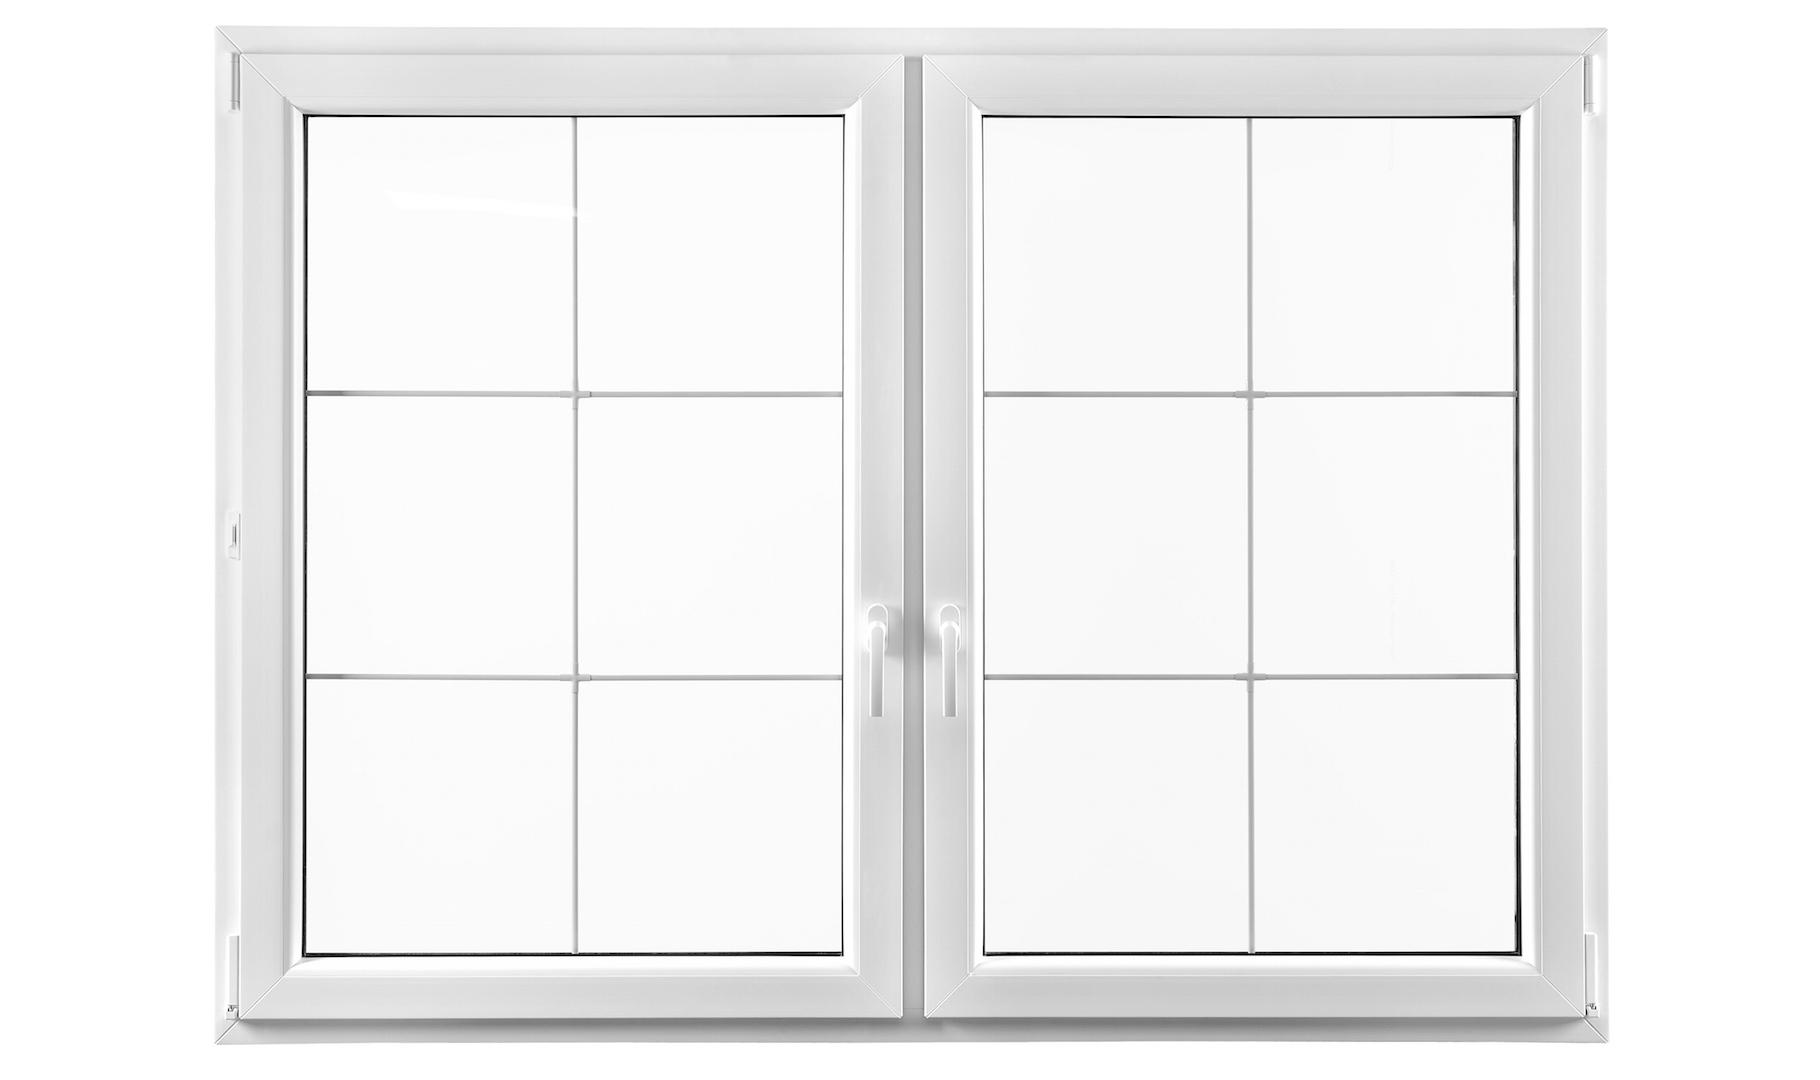 okna pcv iglo5 d sterowanie domem warszawa. Black Bedroom Furniture Sets. Home Design Ideas